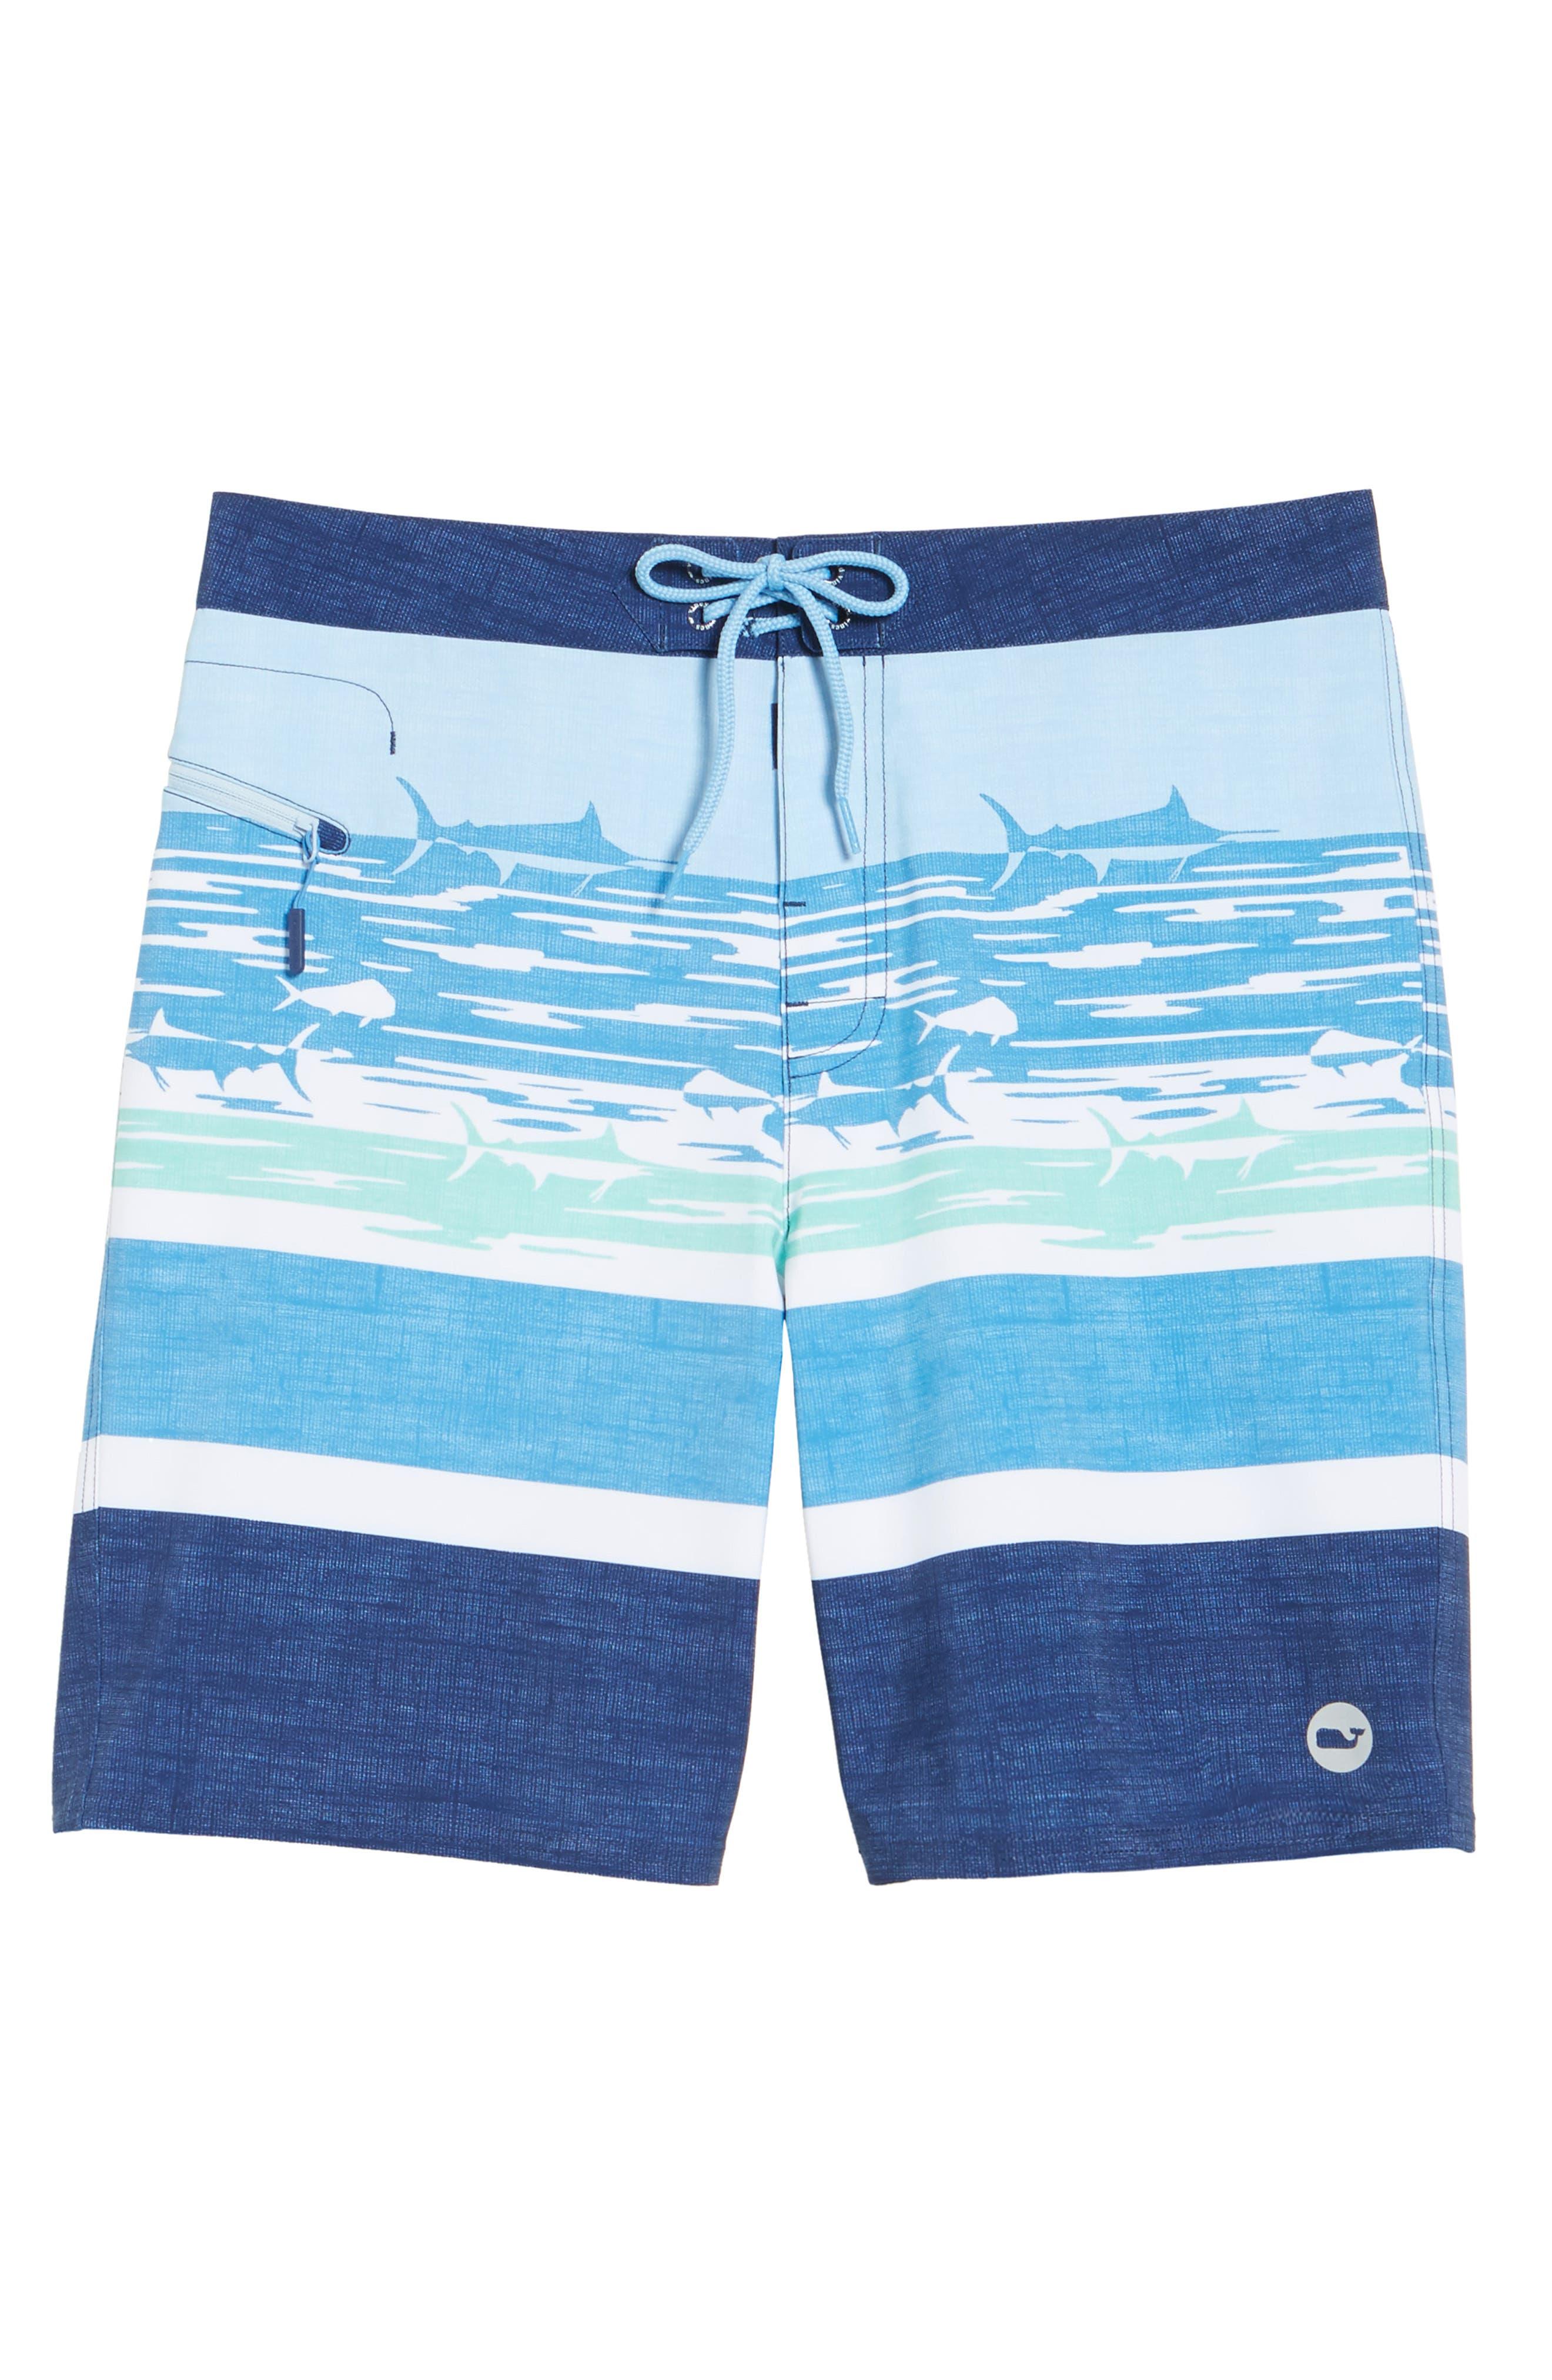 At Sea Scenic Board Shorts,                             Alternate thumbnail 6, color,